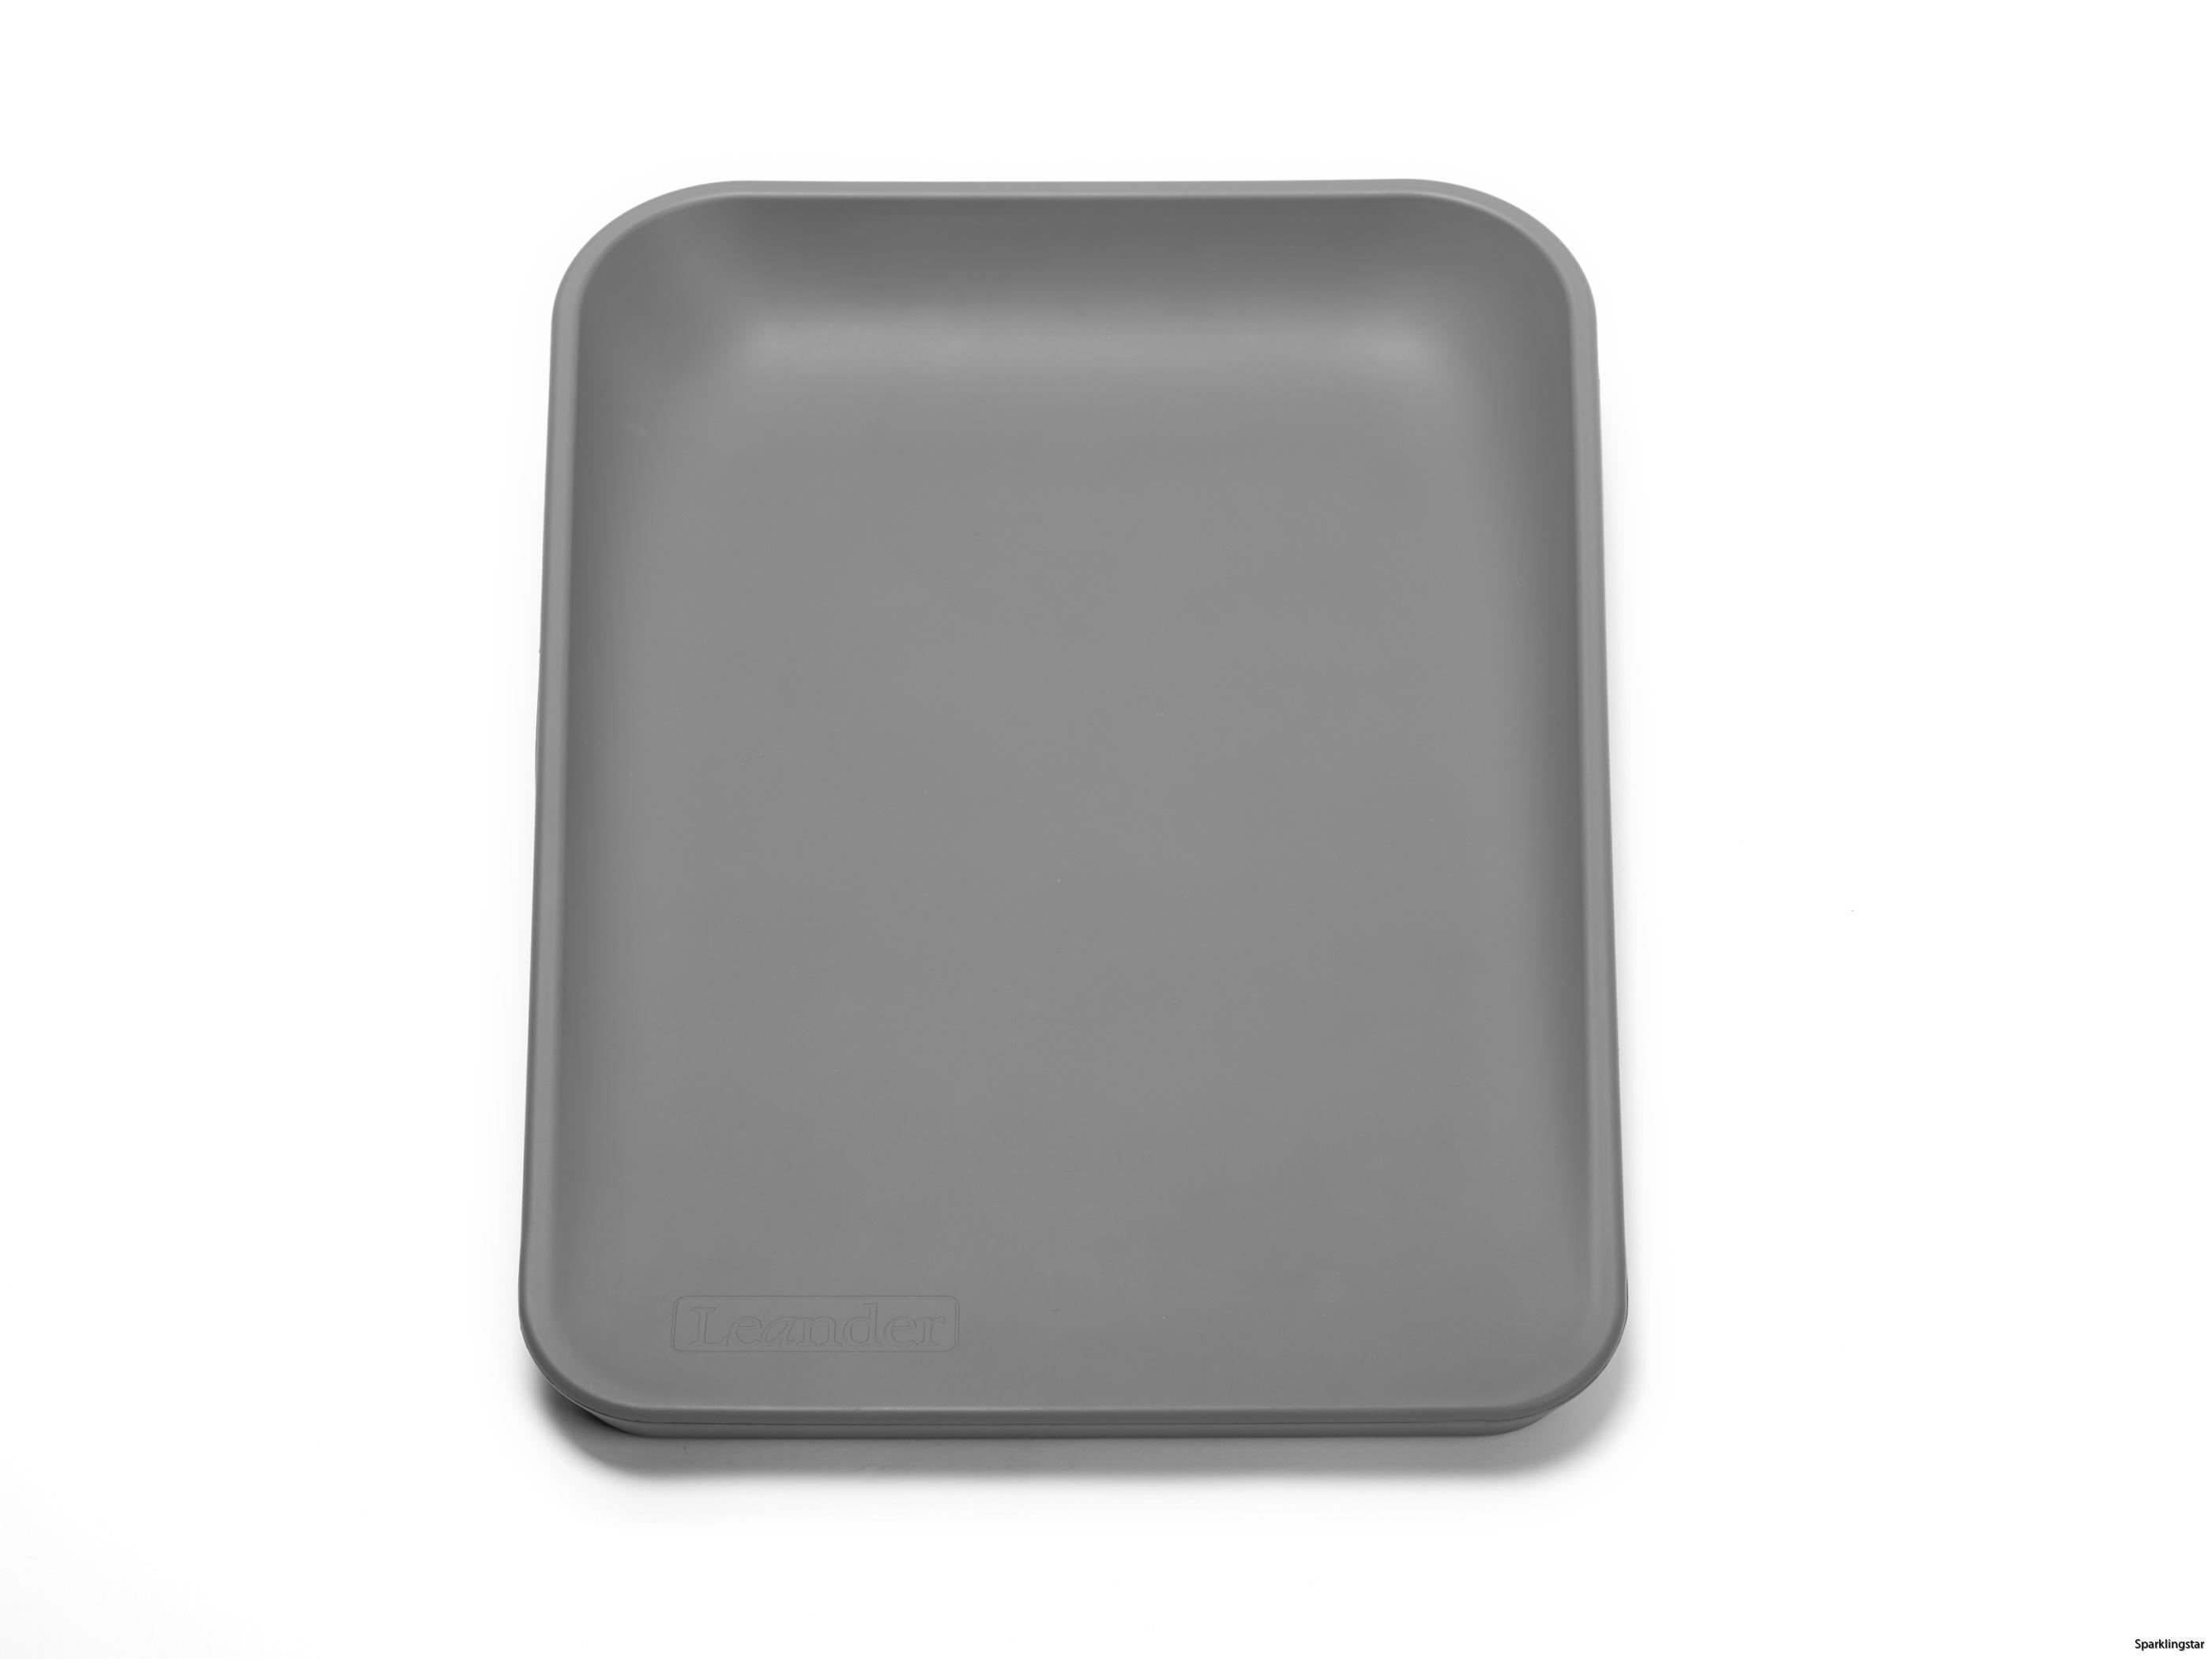 leander-matty-510010-72